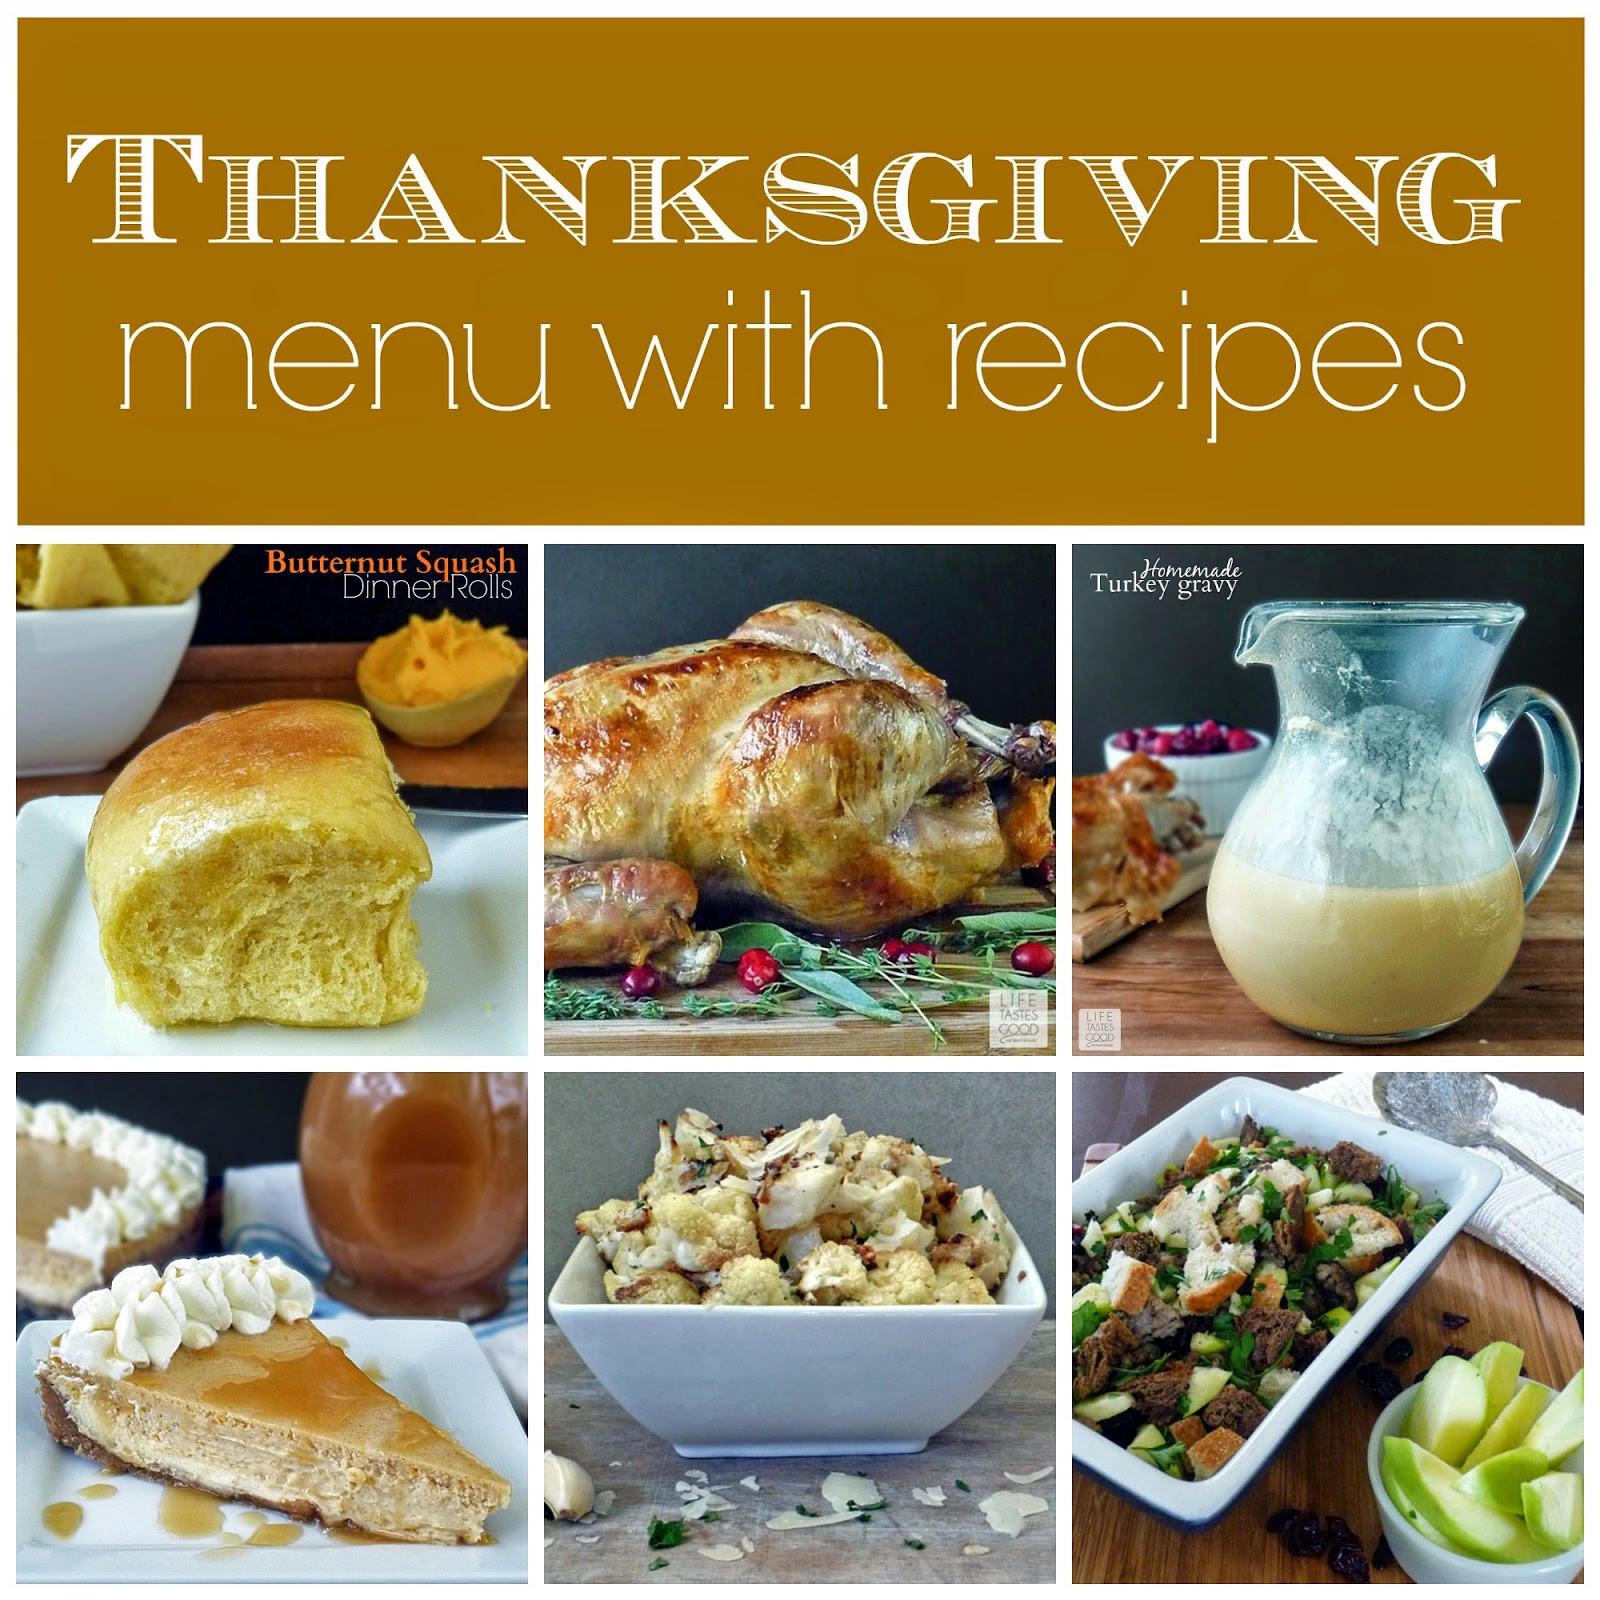 Traditional Thanksgiving Dinner Menu  Thanksgiving Dinner Menu and Recipes